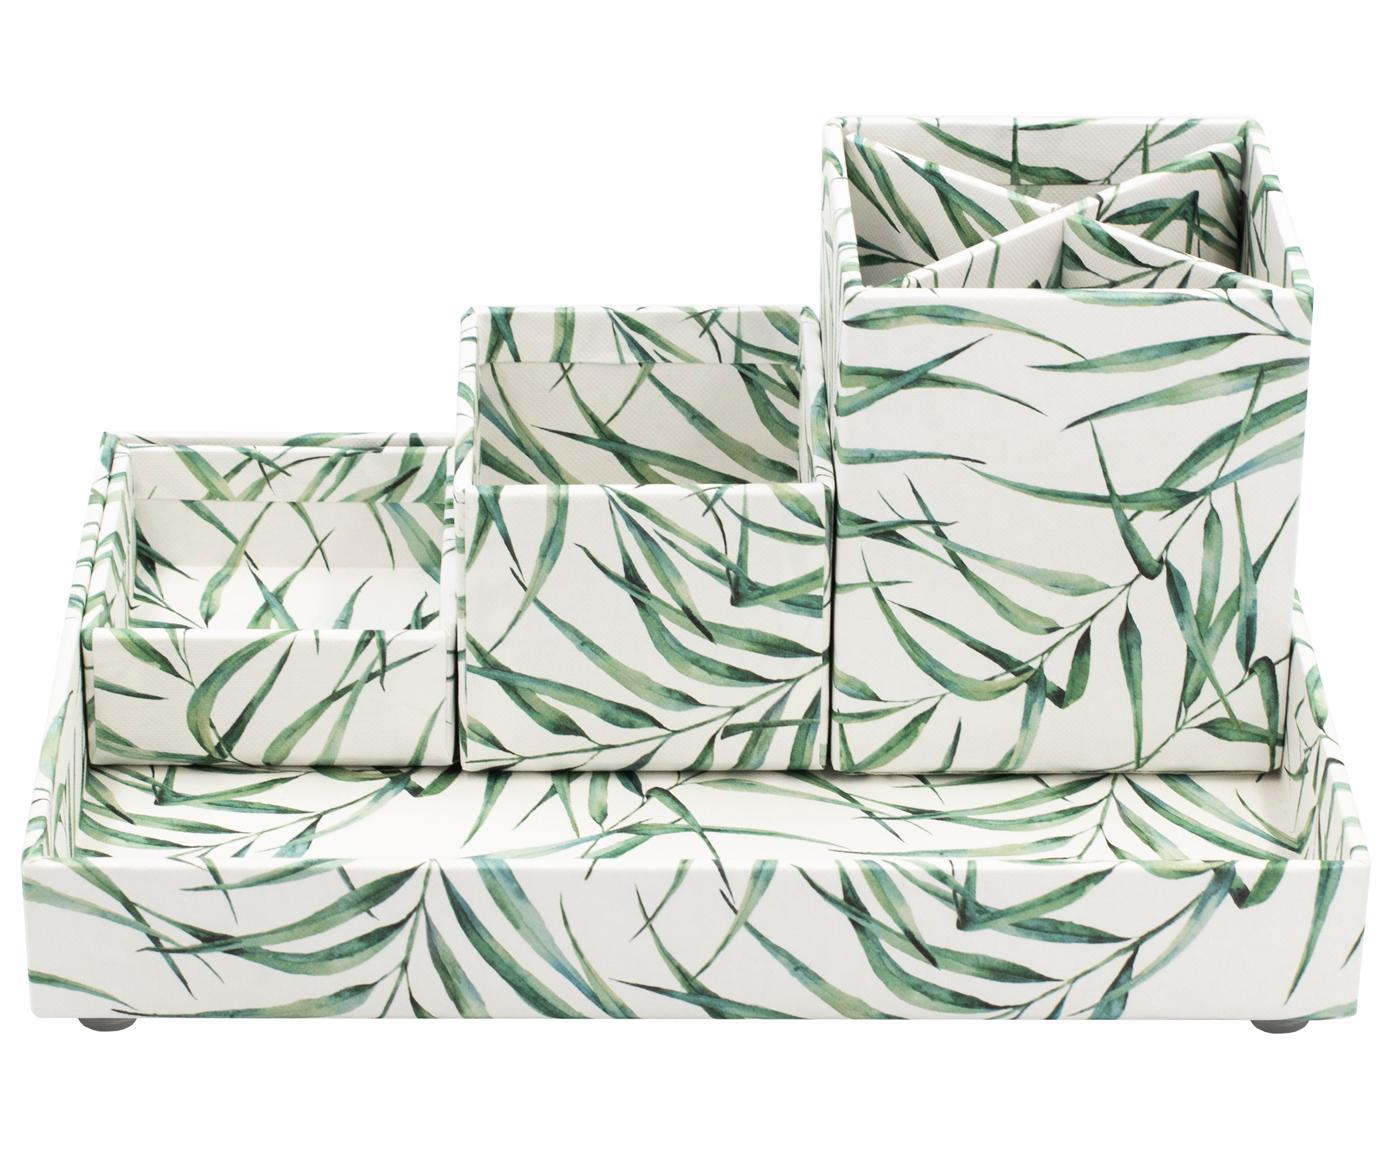 Bureau-organizer Breeze, Stevig, gelamineerd karton, Wit, groen, Verschillende formaten